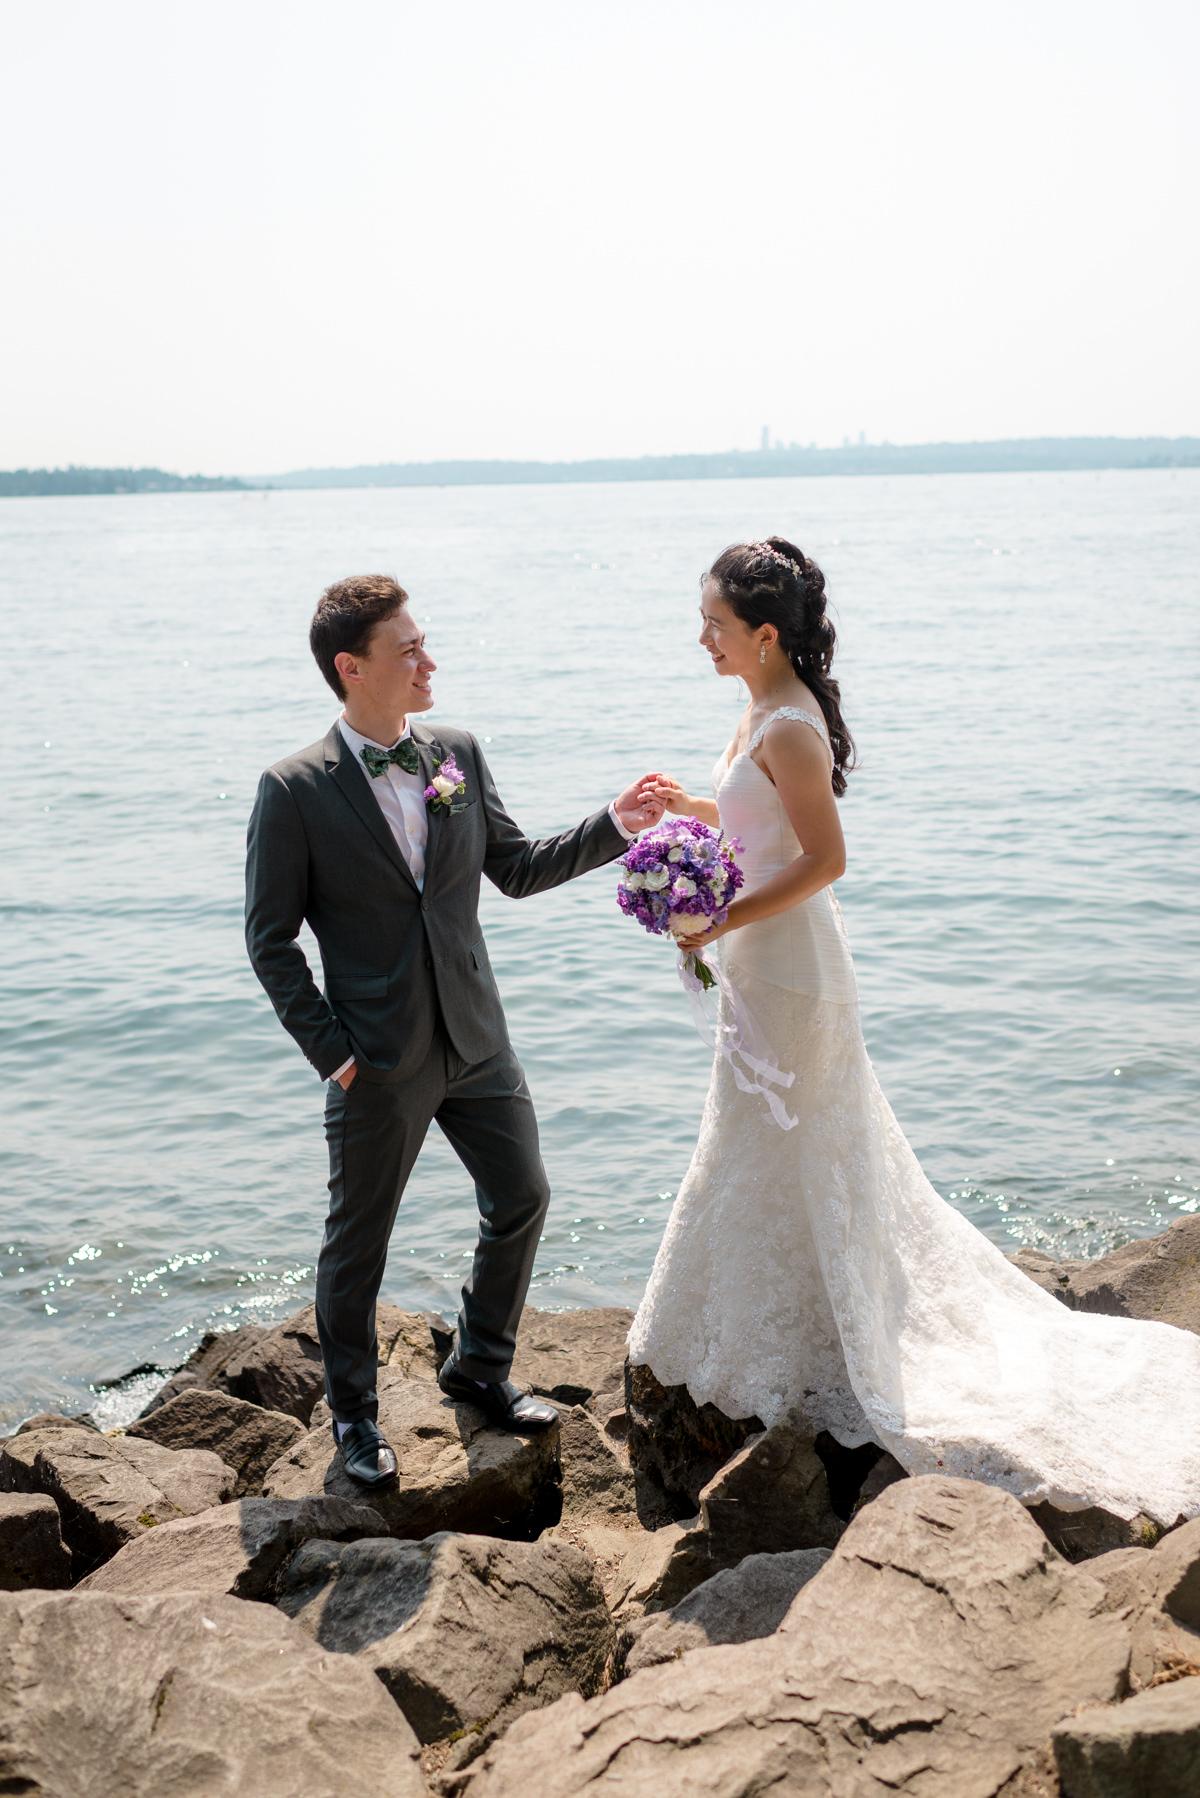 Andrew Tat - Documentary Wedding Photography - Heritage Hall - Kirkland, Washington - Grace & James - 30.JPG